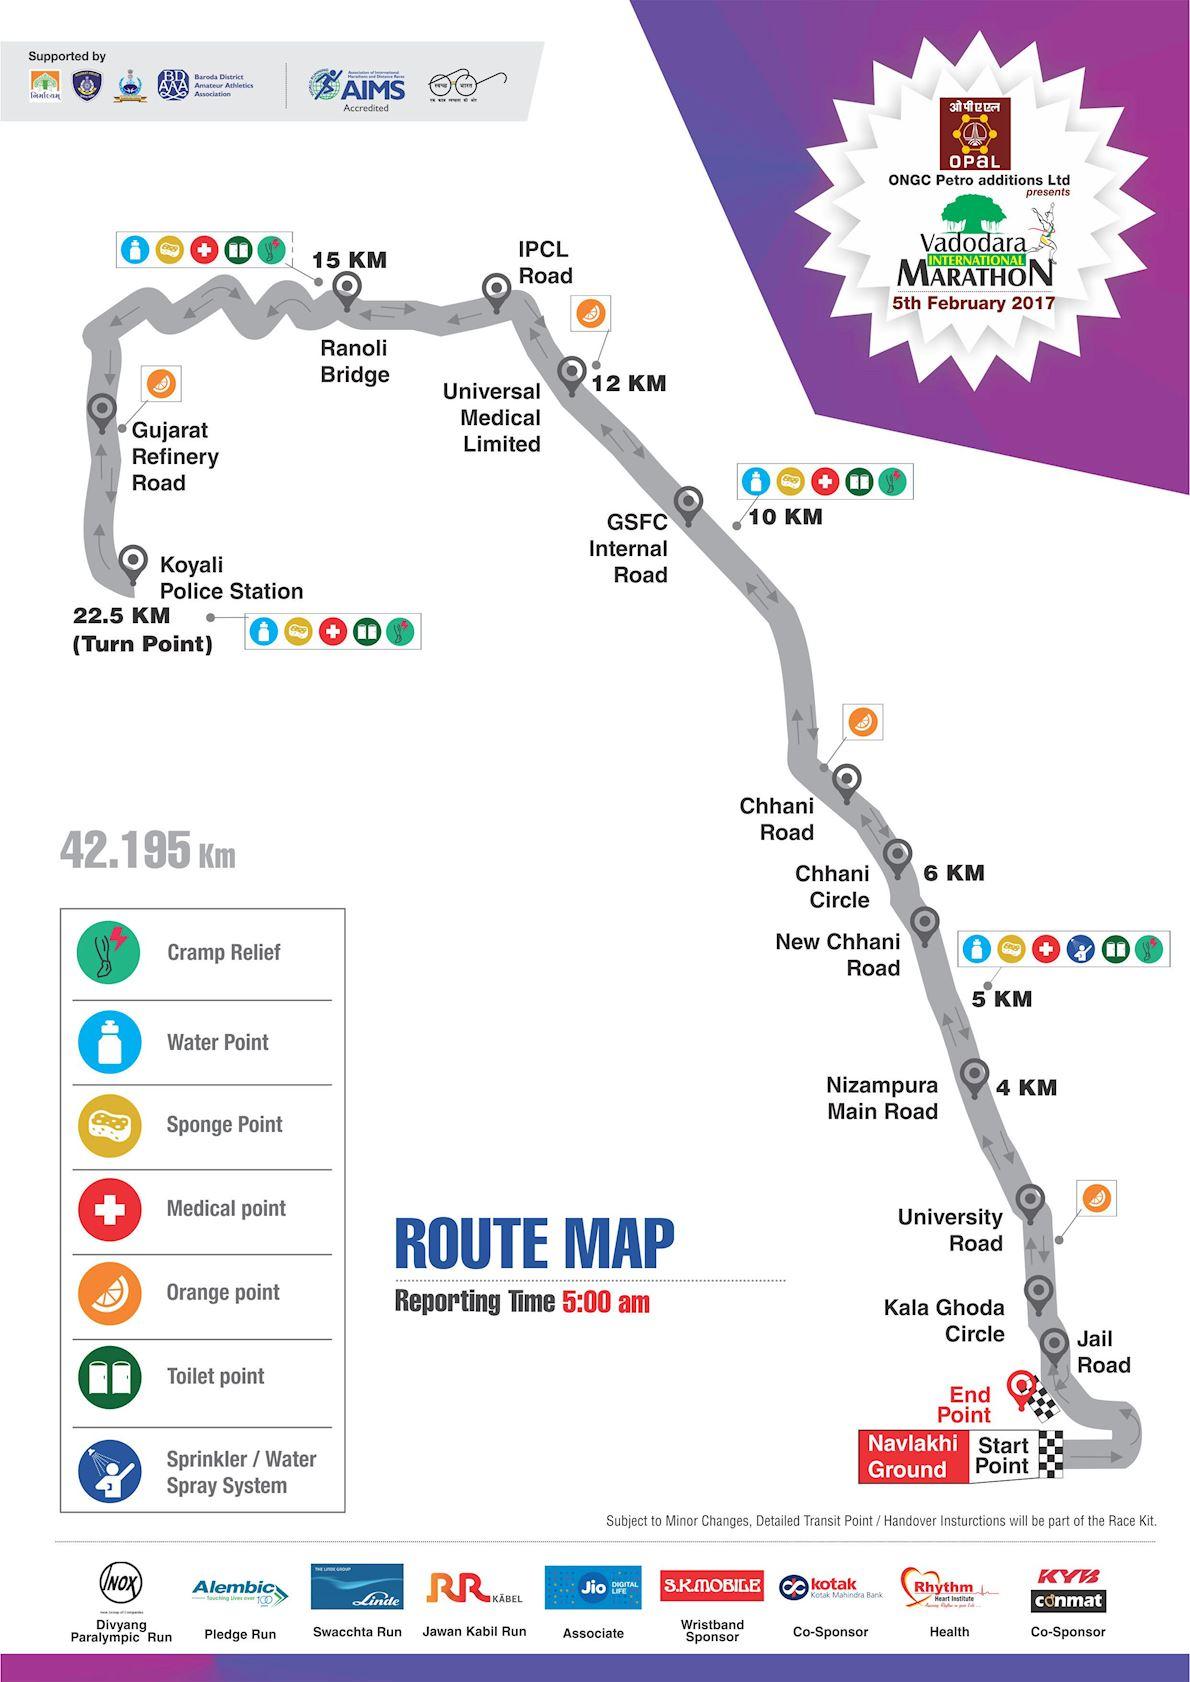 Vadodara International Marathon Route Map